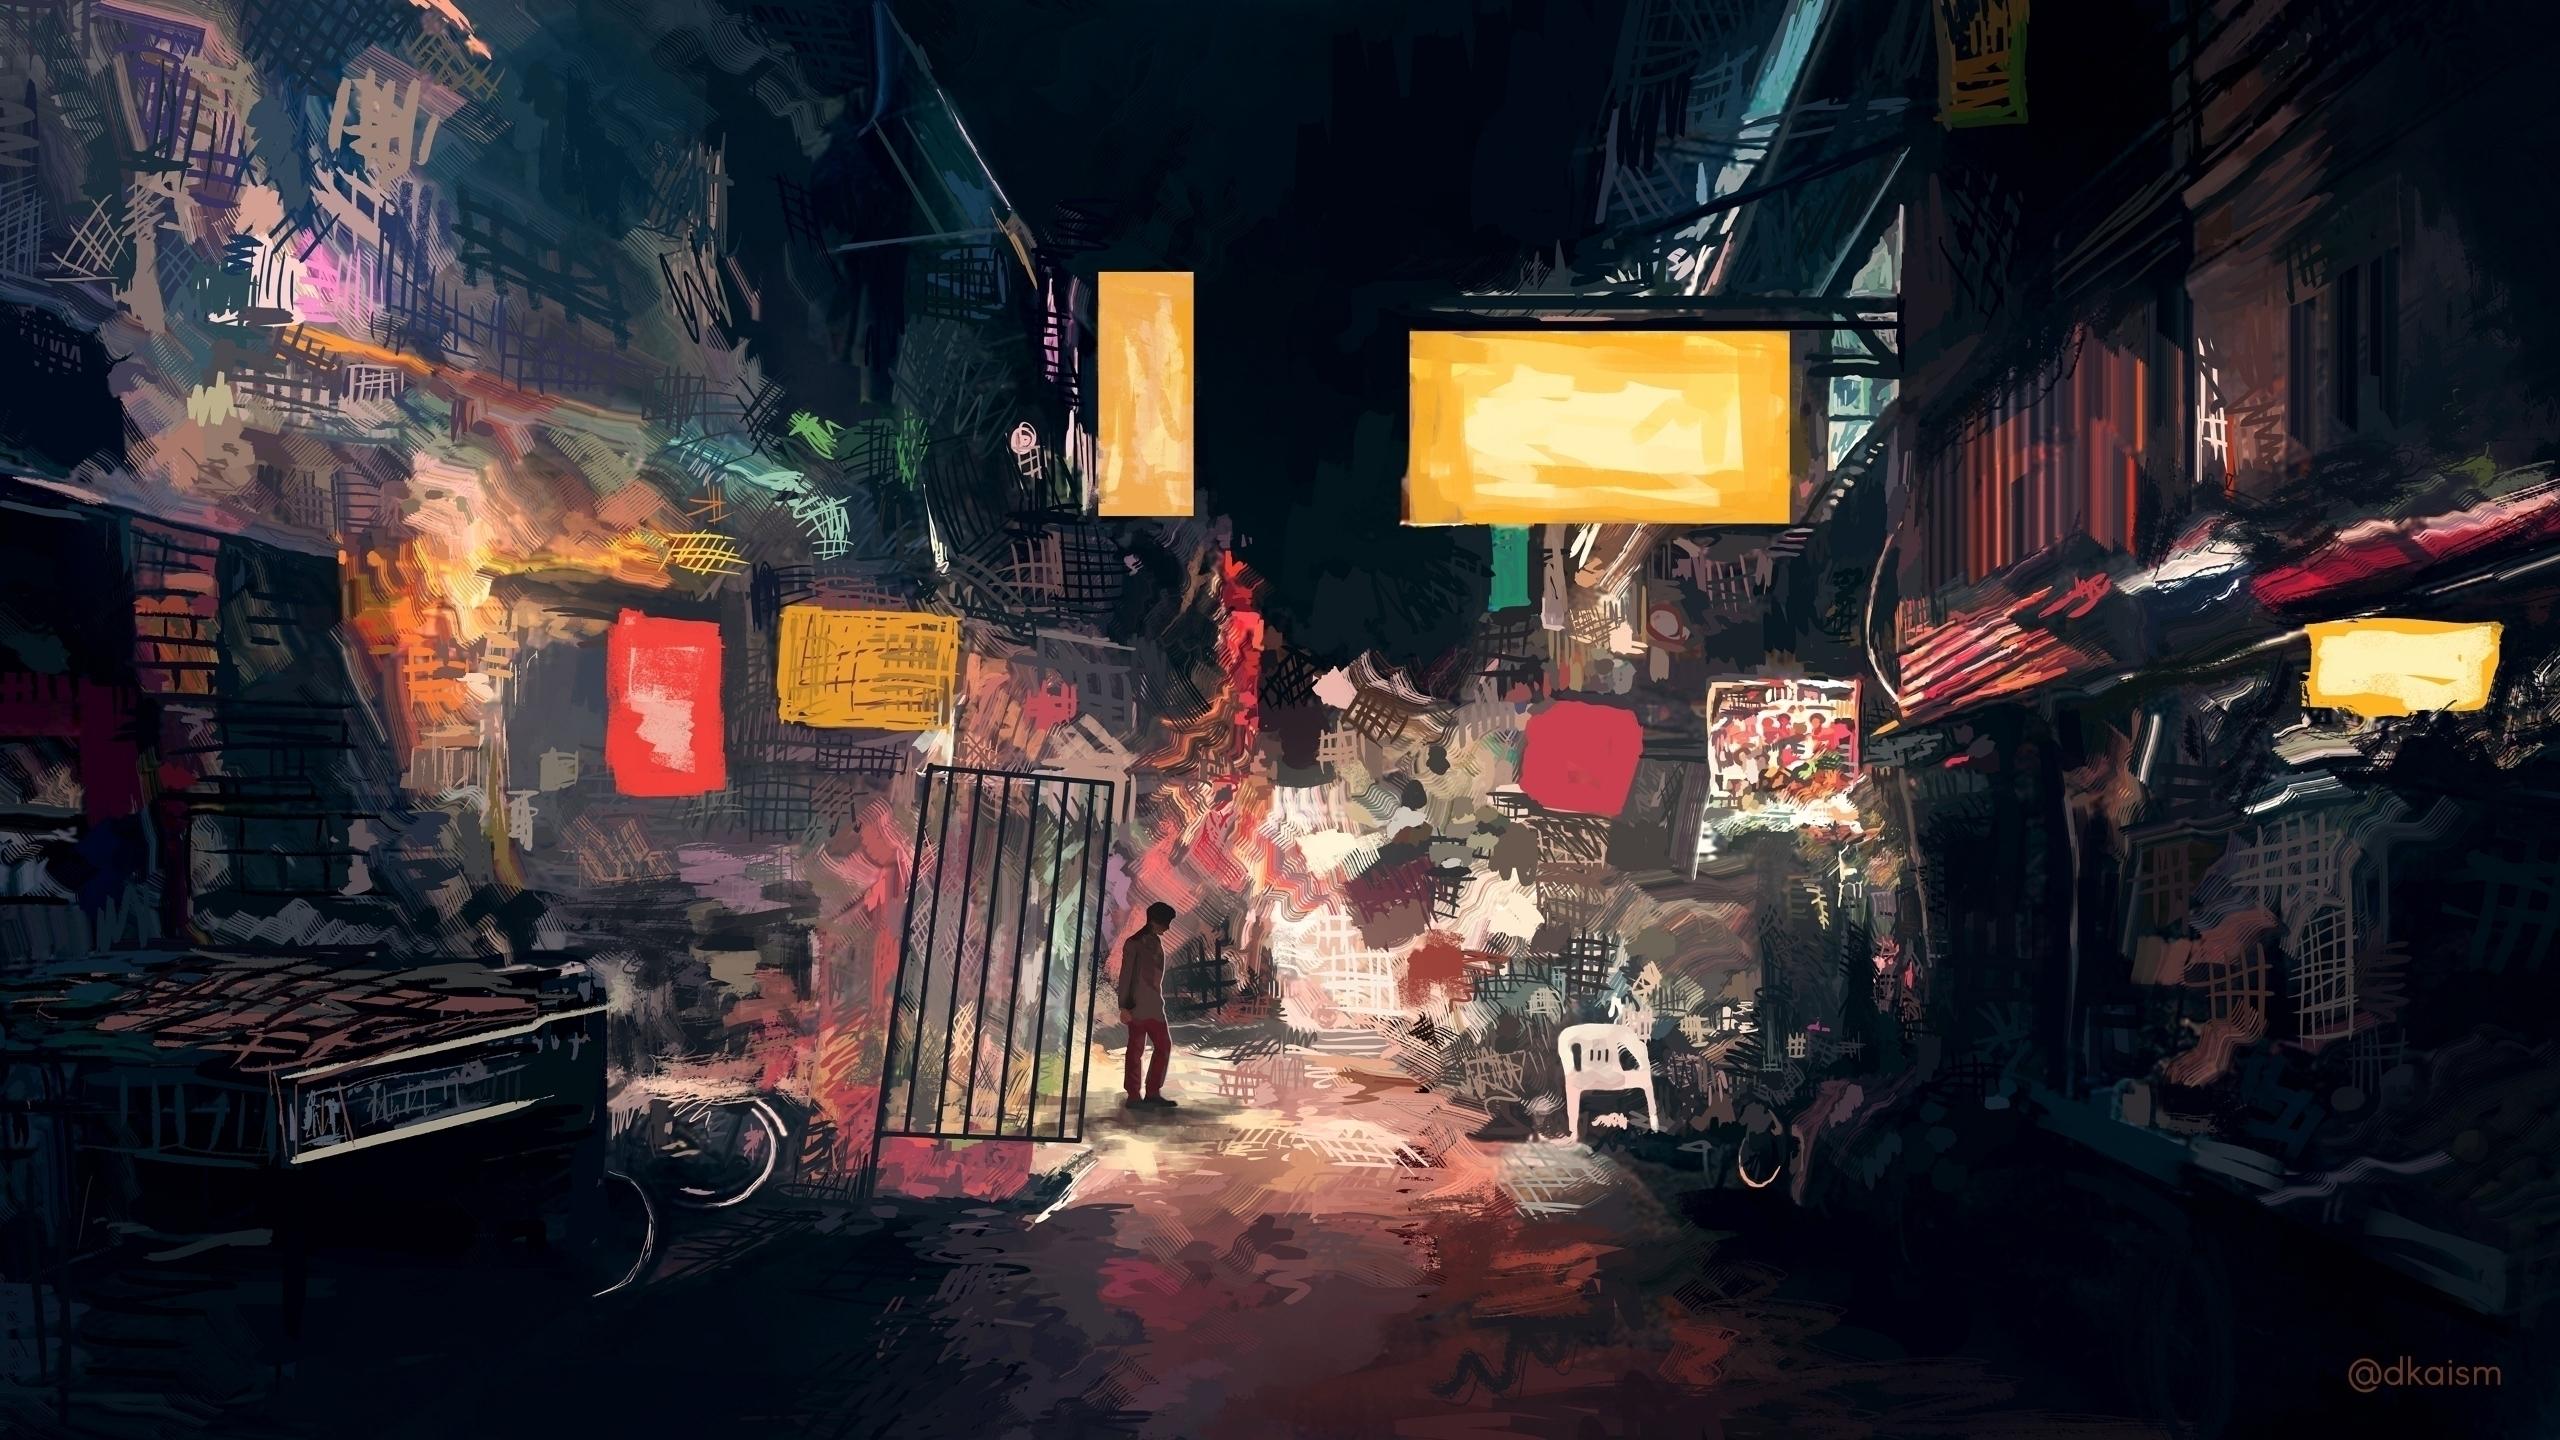 Artist: DKAISM (Daniel Ignacio - dkaism | ello